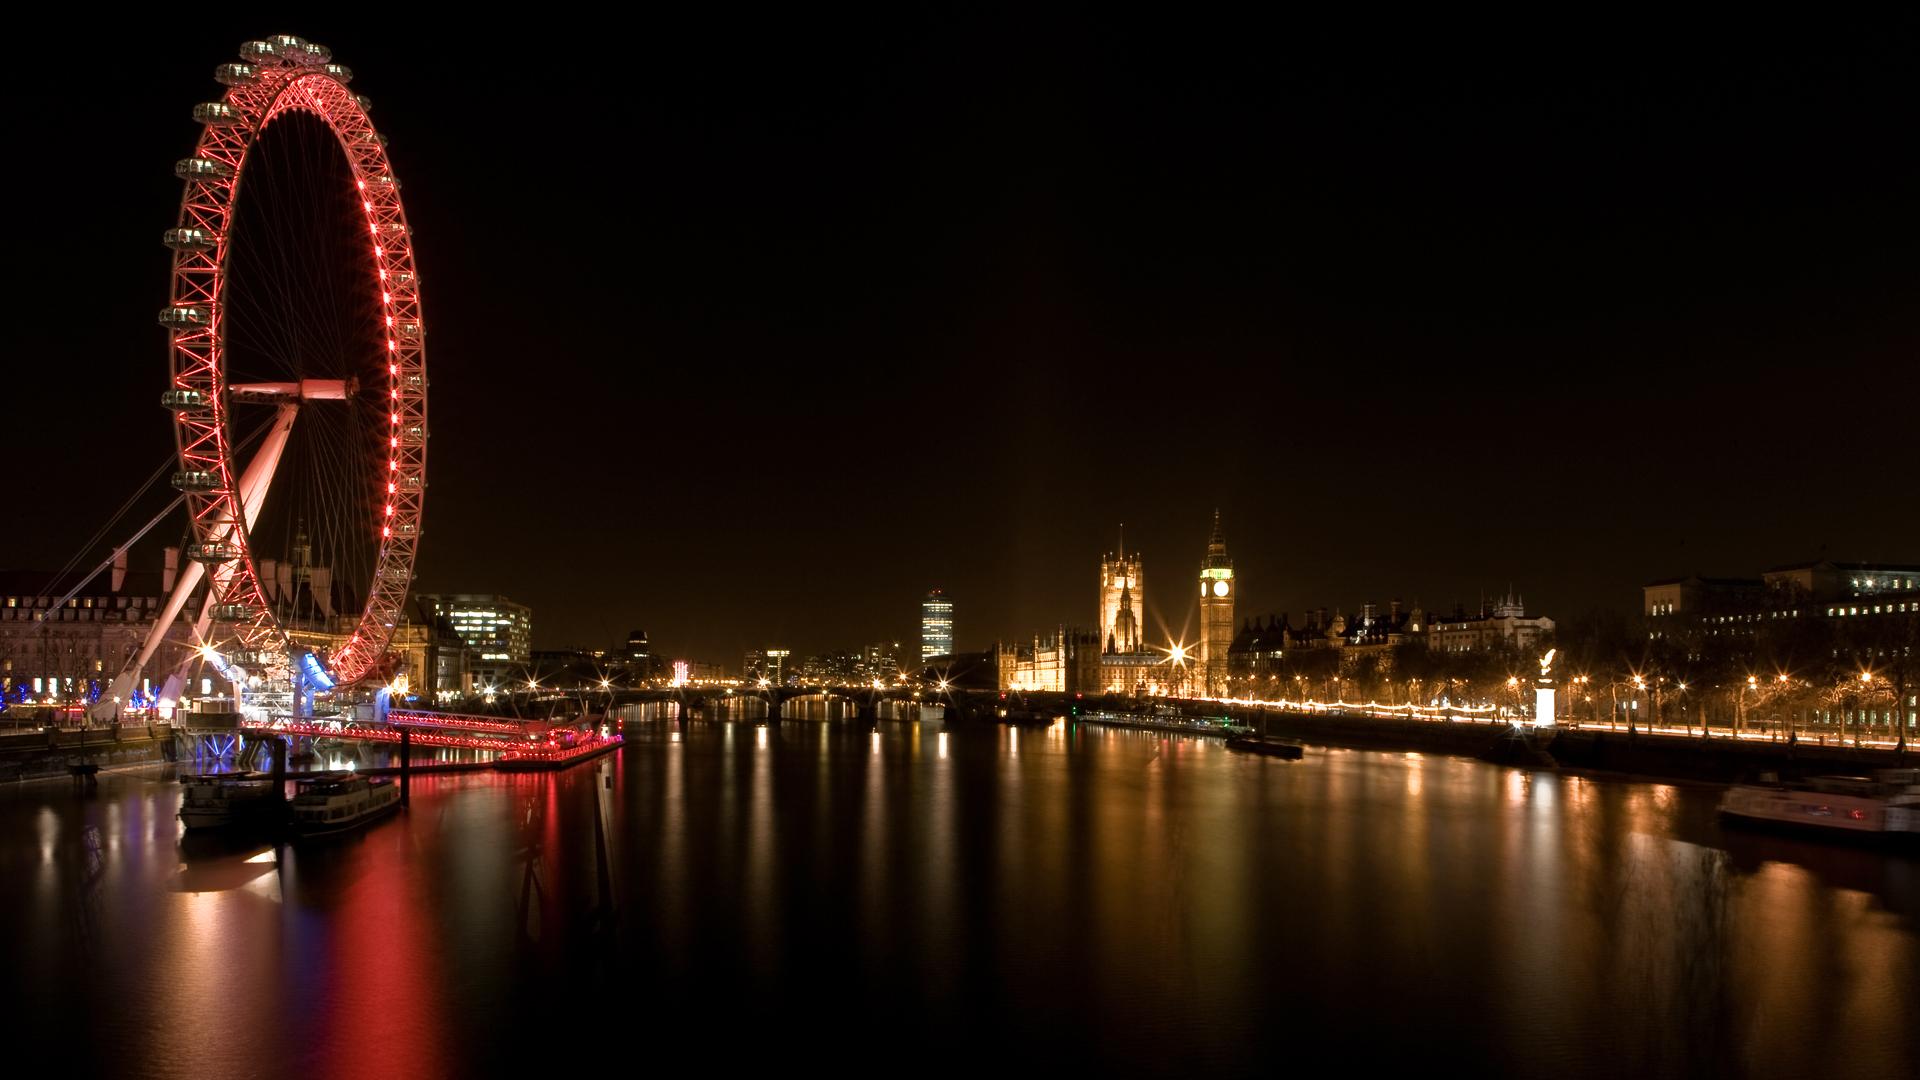 london hd images - photo #19